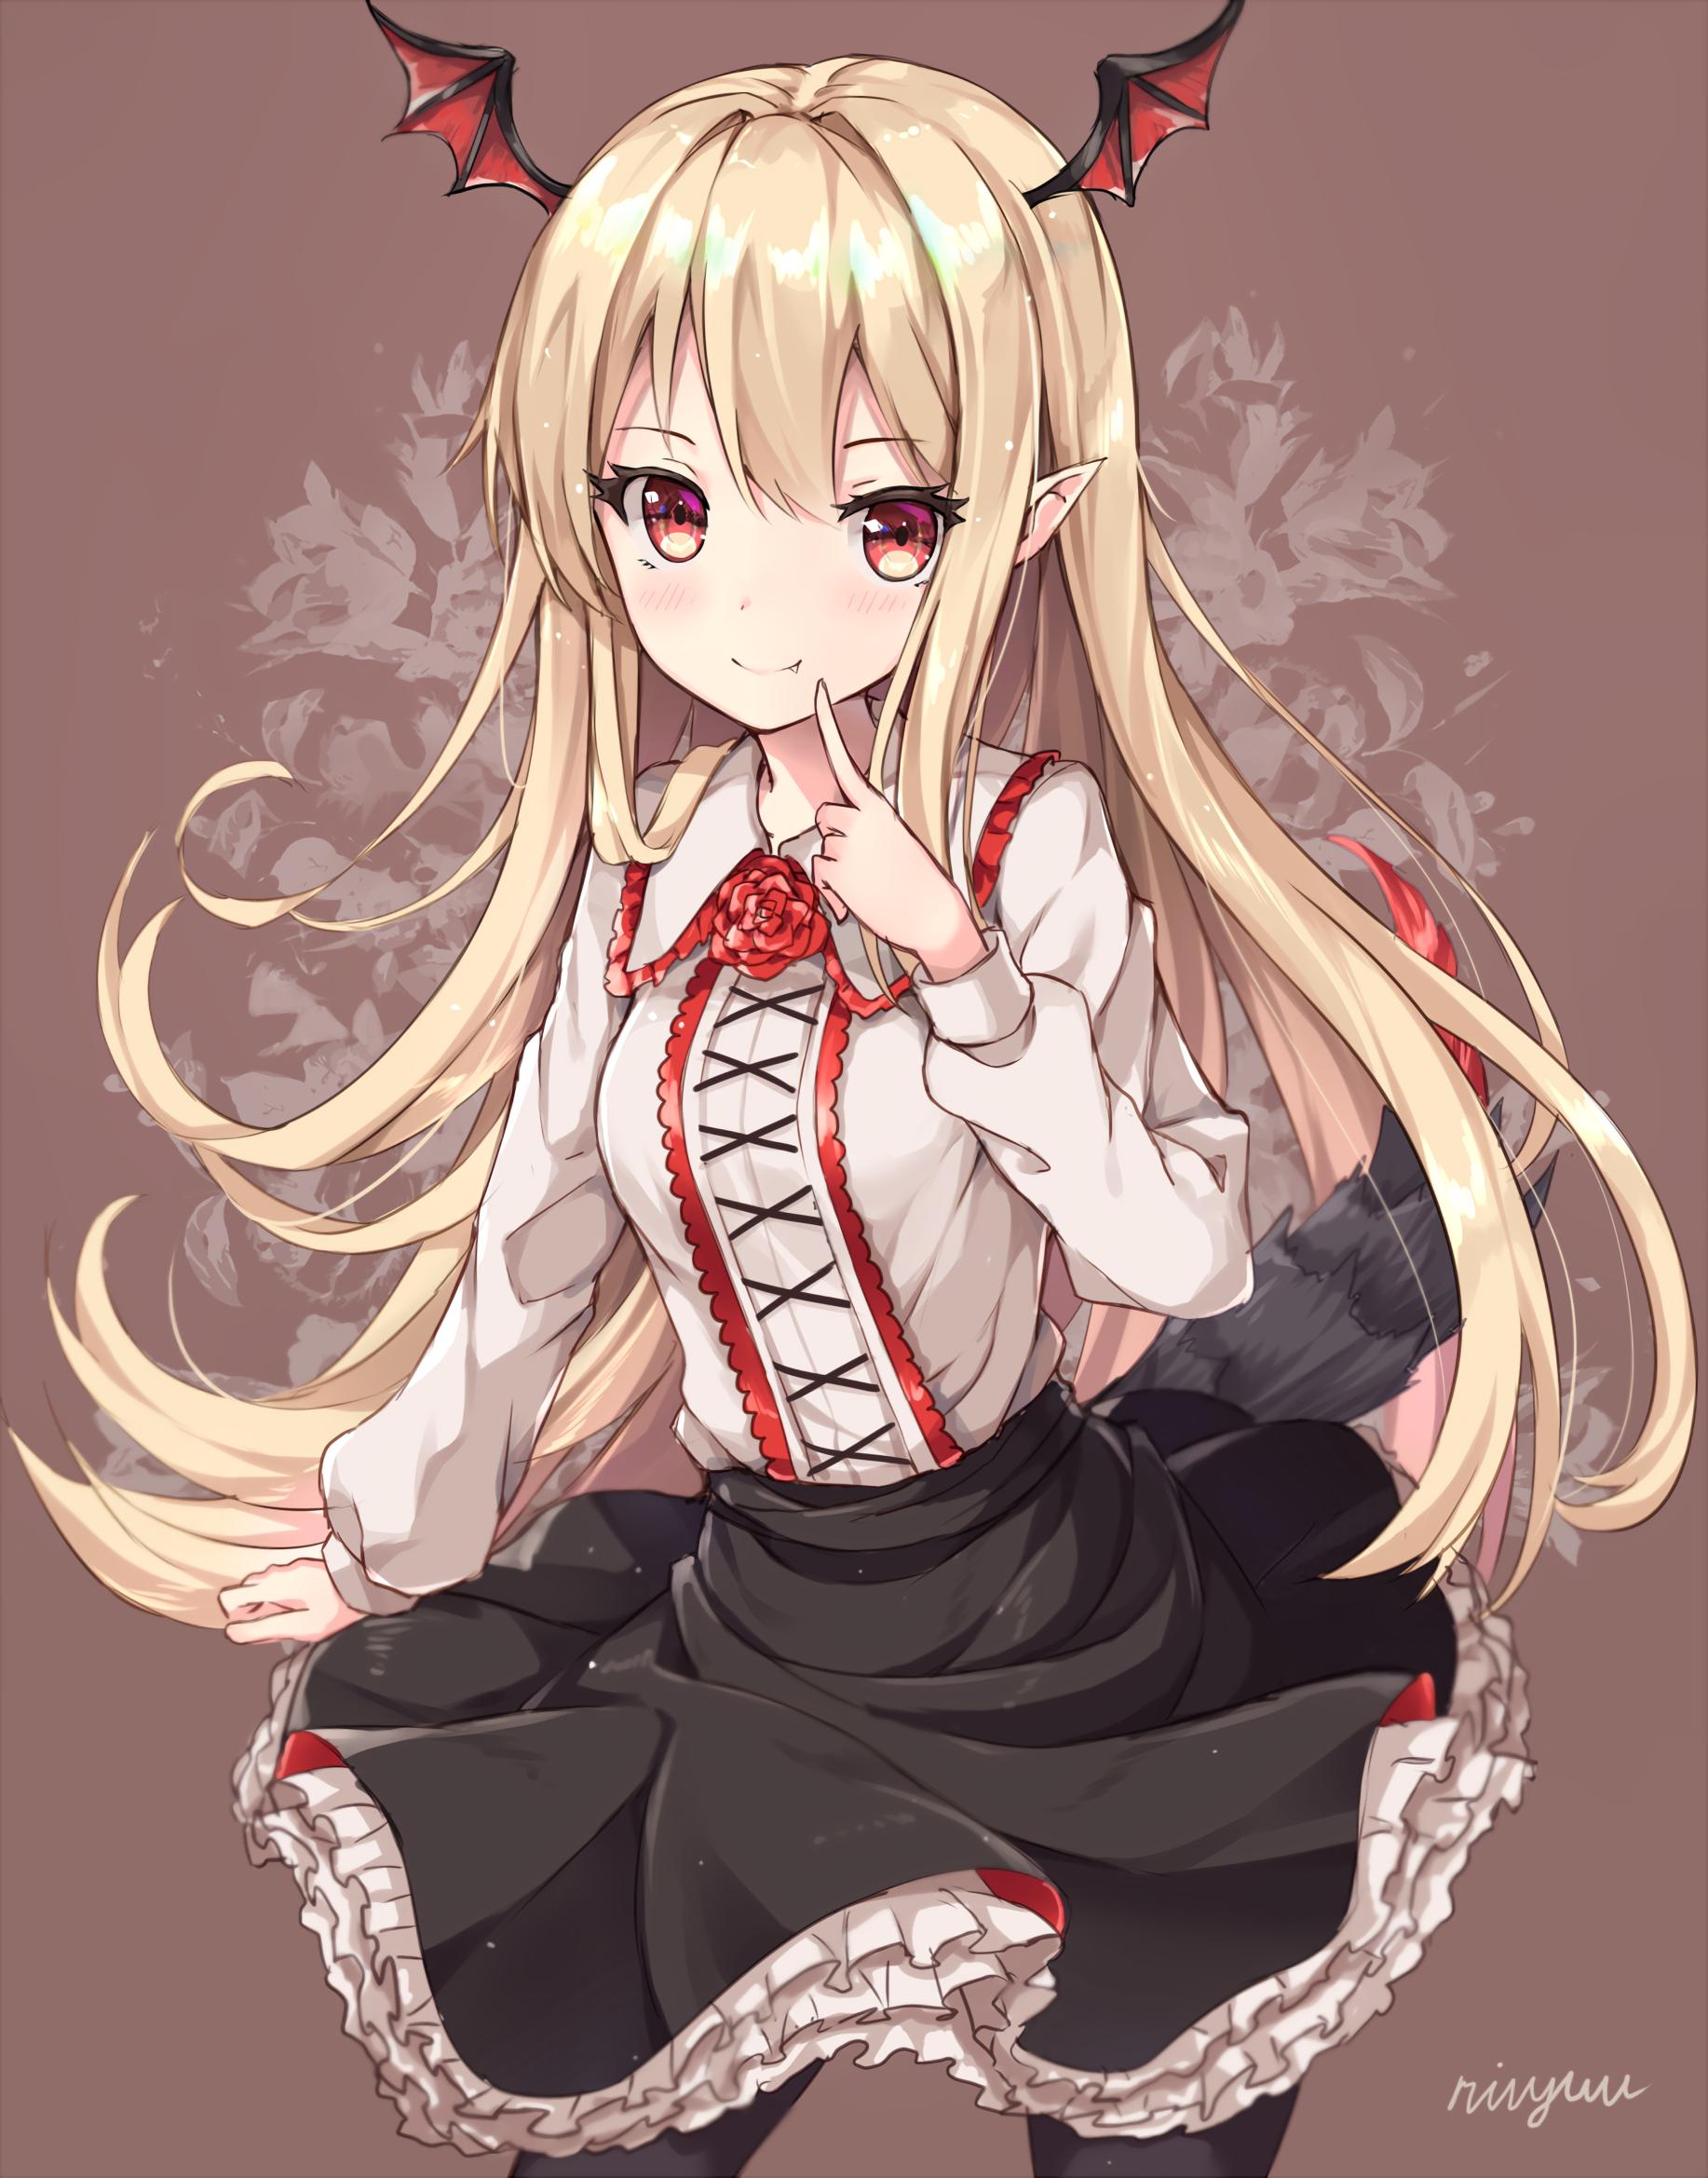 Anime anime girls long hair granblue fantasy blonde wings red eyes tail